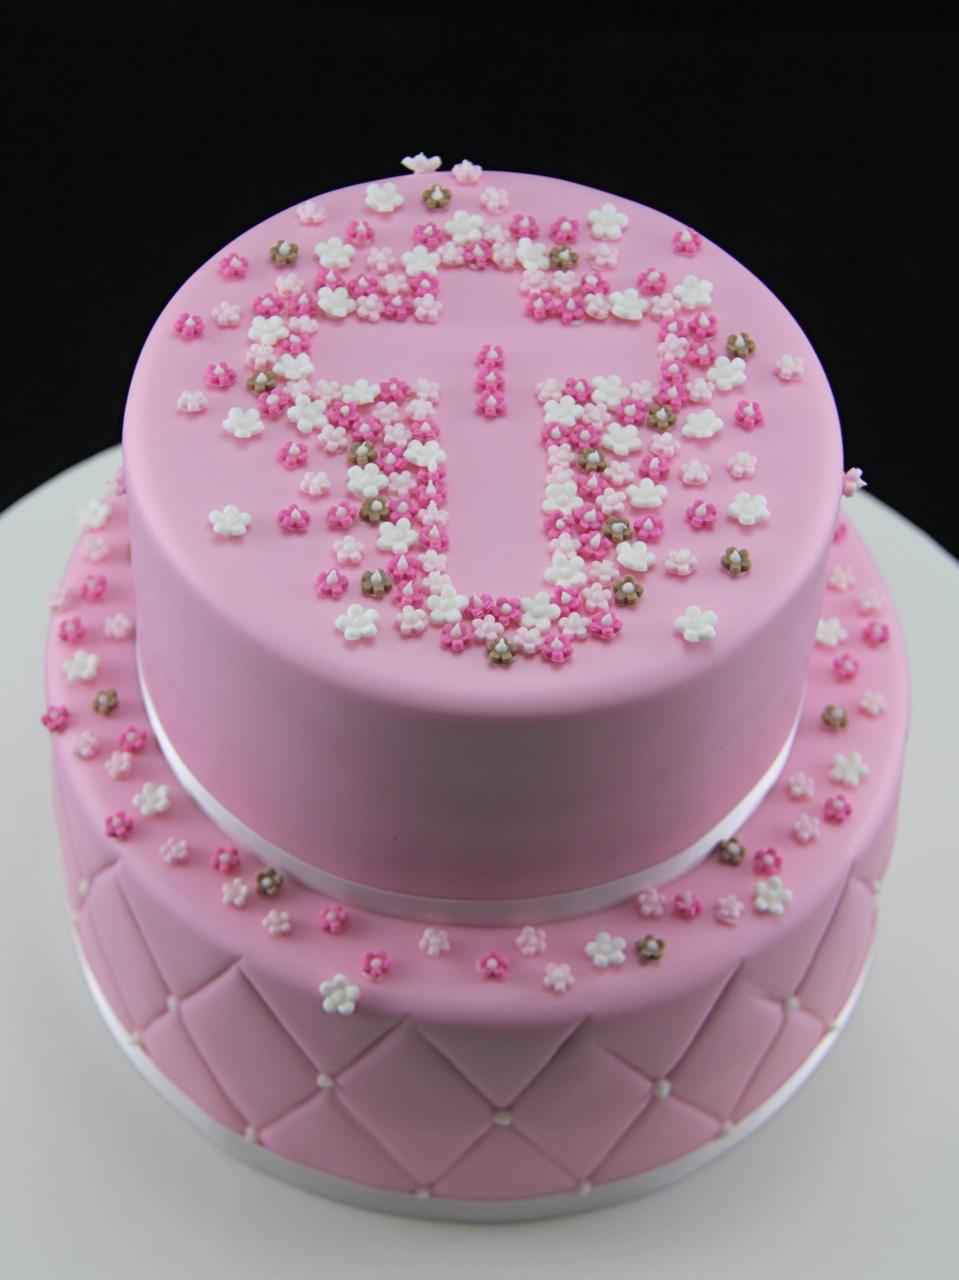 Cake Design For Christening : Coco Jo Cake Design: Pink Christening Cake